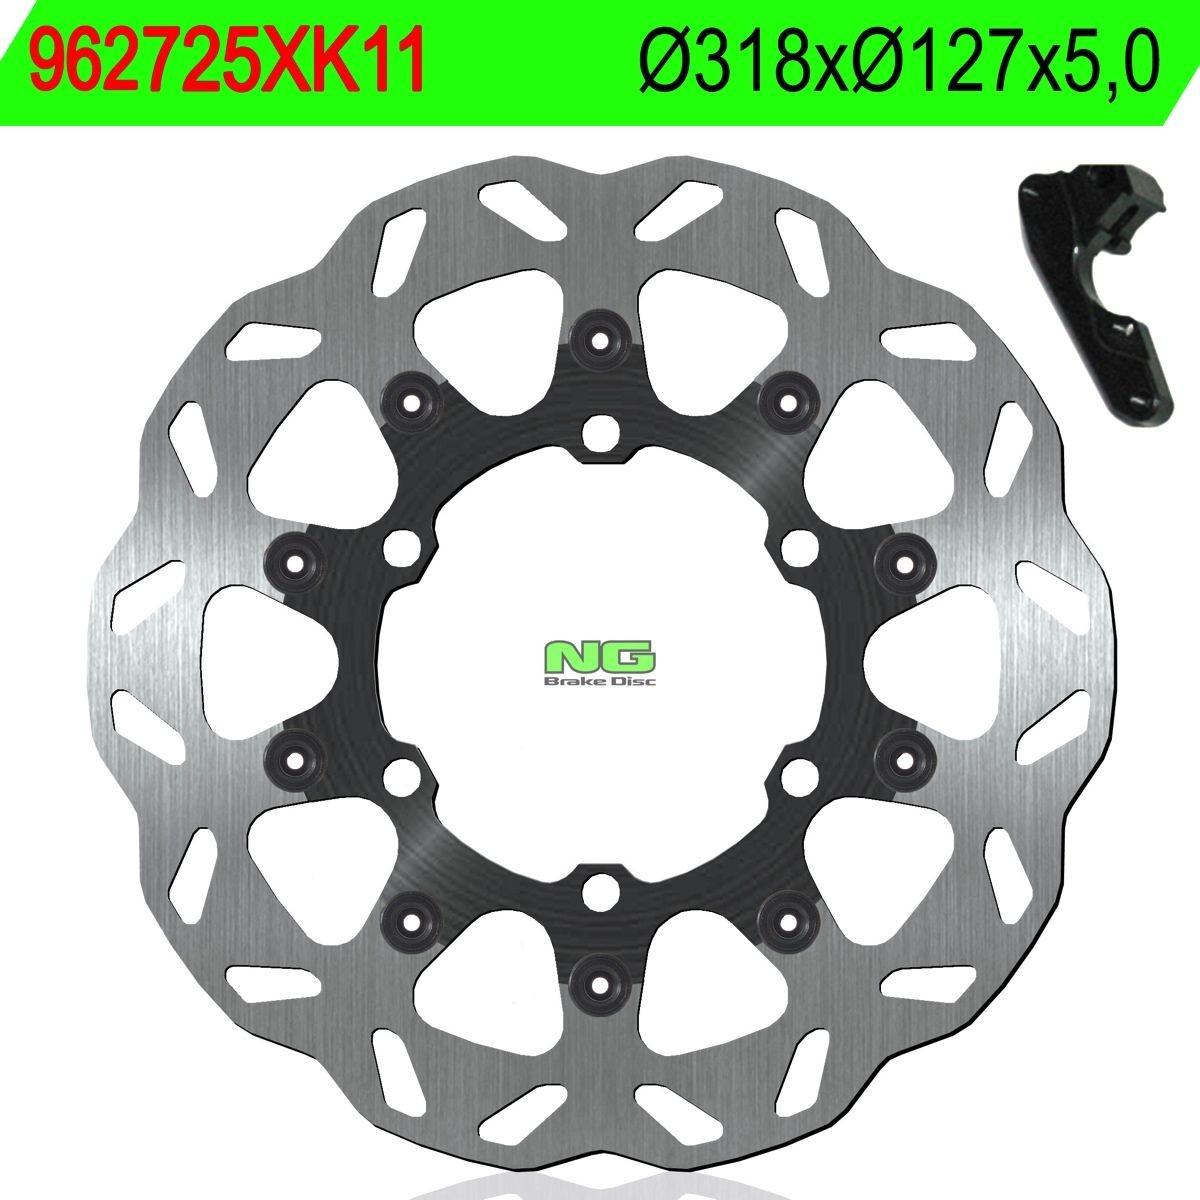 KTM - Disco de freno NG kit ondulado725XK11 Ø320 x Ø127 x 5 -